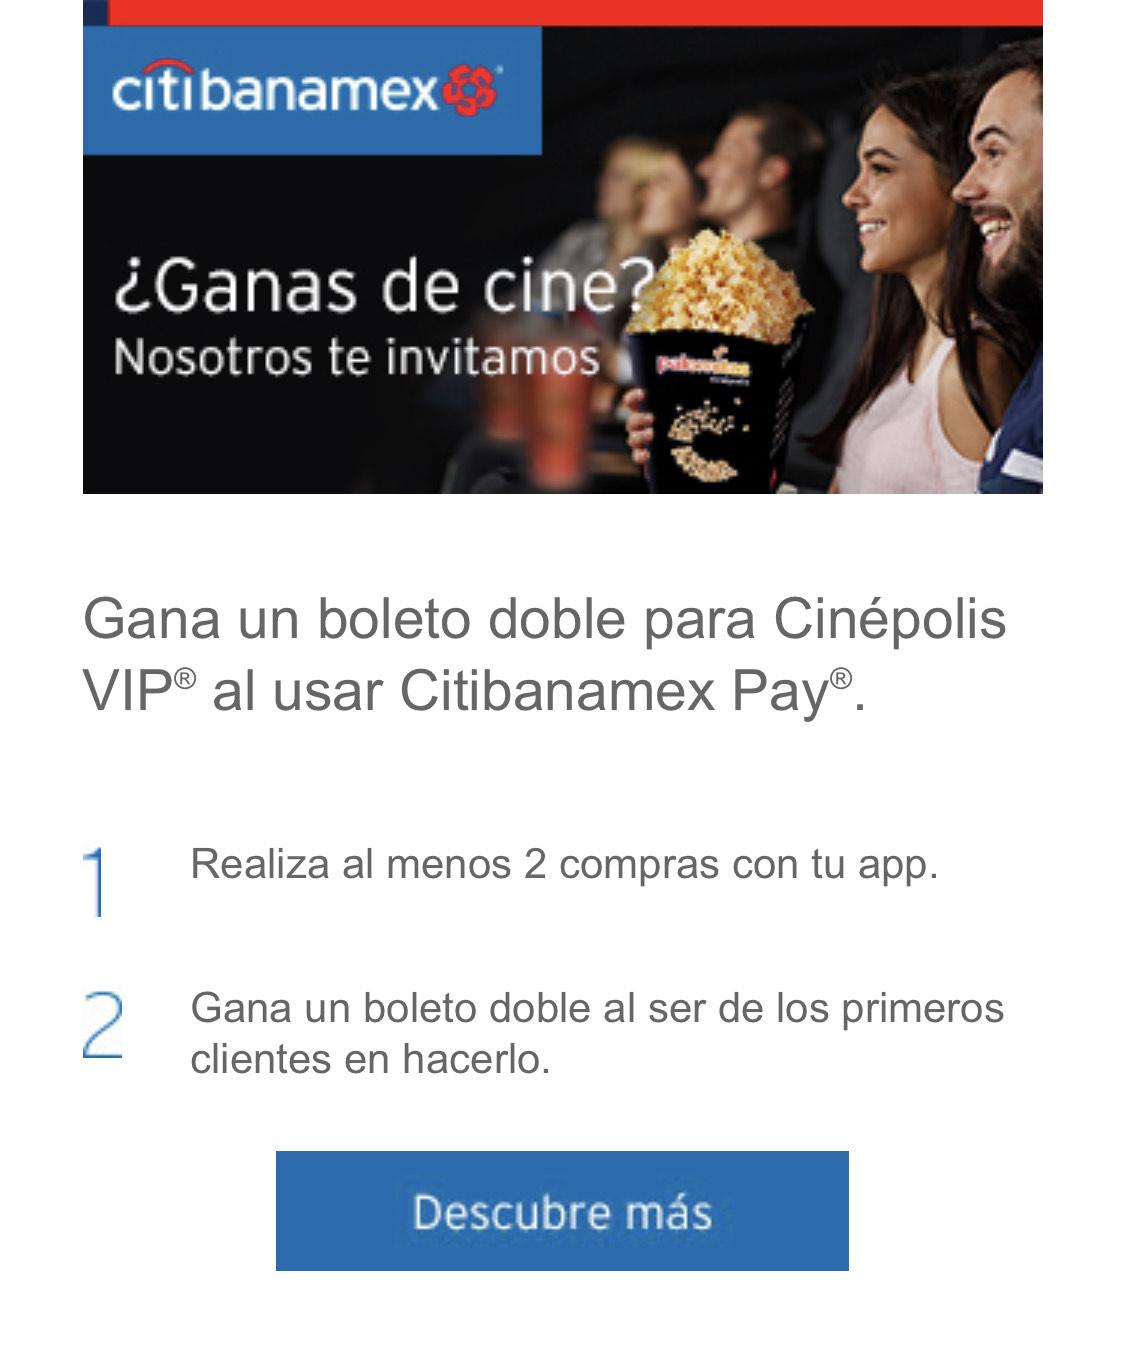 Citibanamex: Gana 2 pases Cinépolis VIP con Citipay